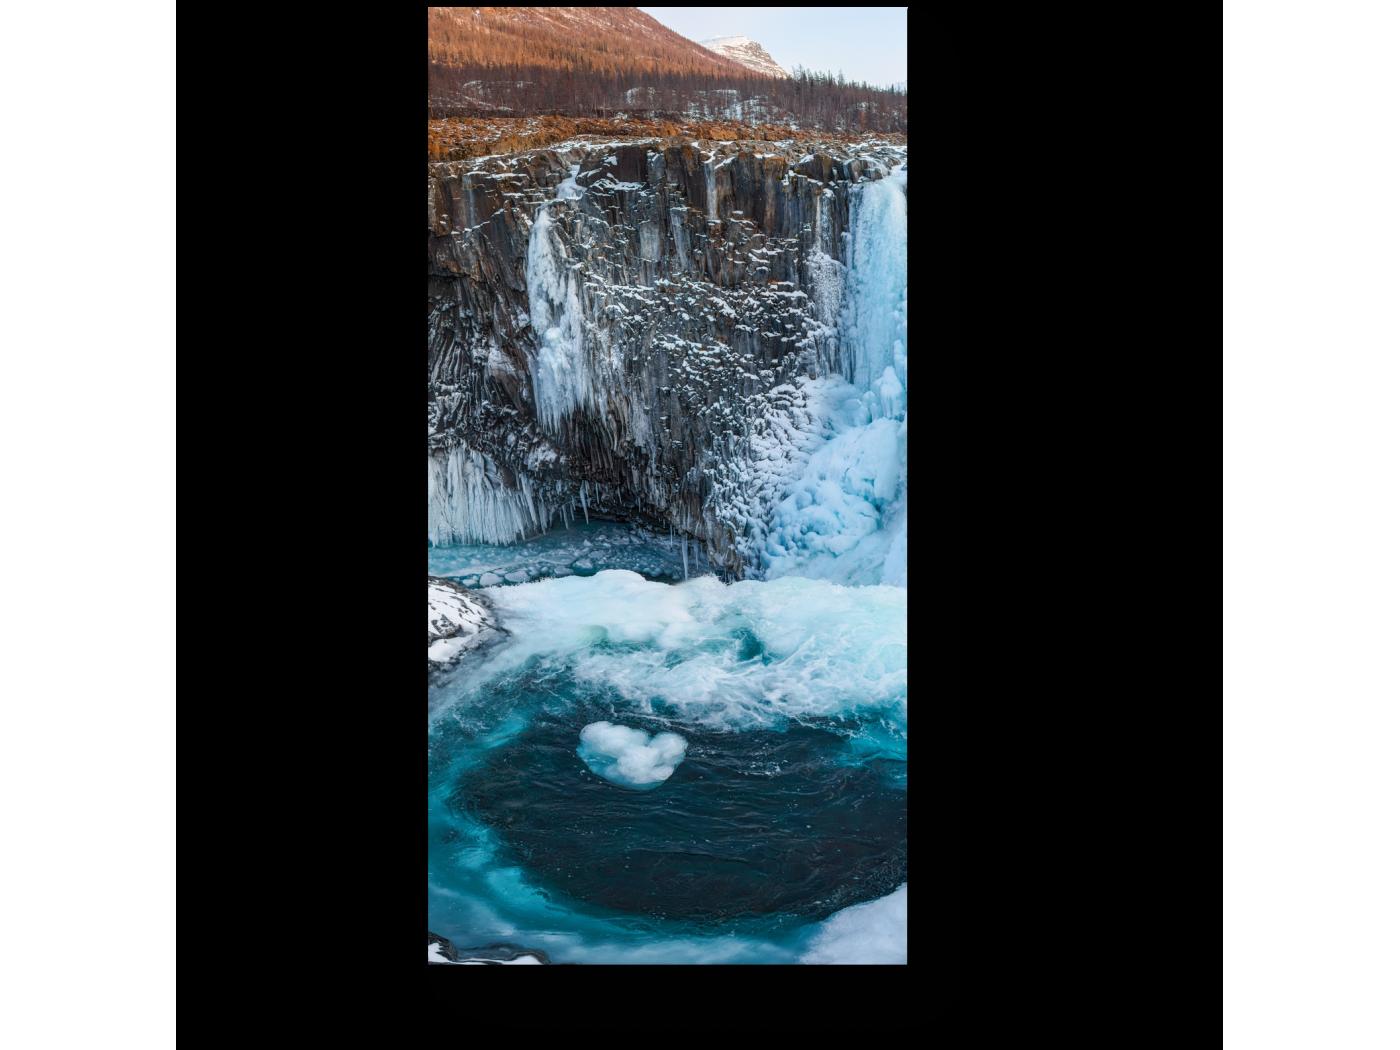 Модульная картина Водопад в плато Путорана (20x40) фото